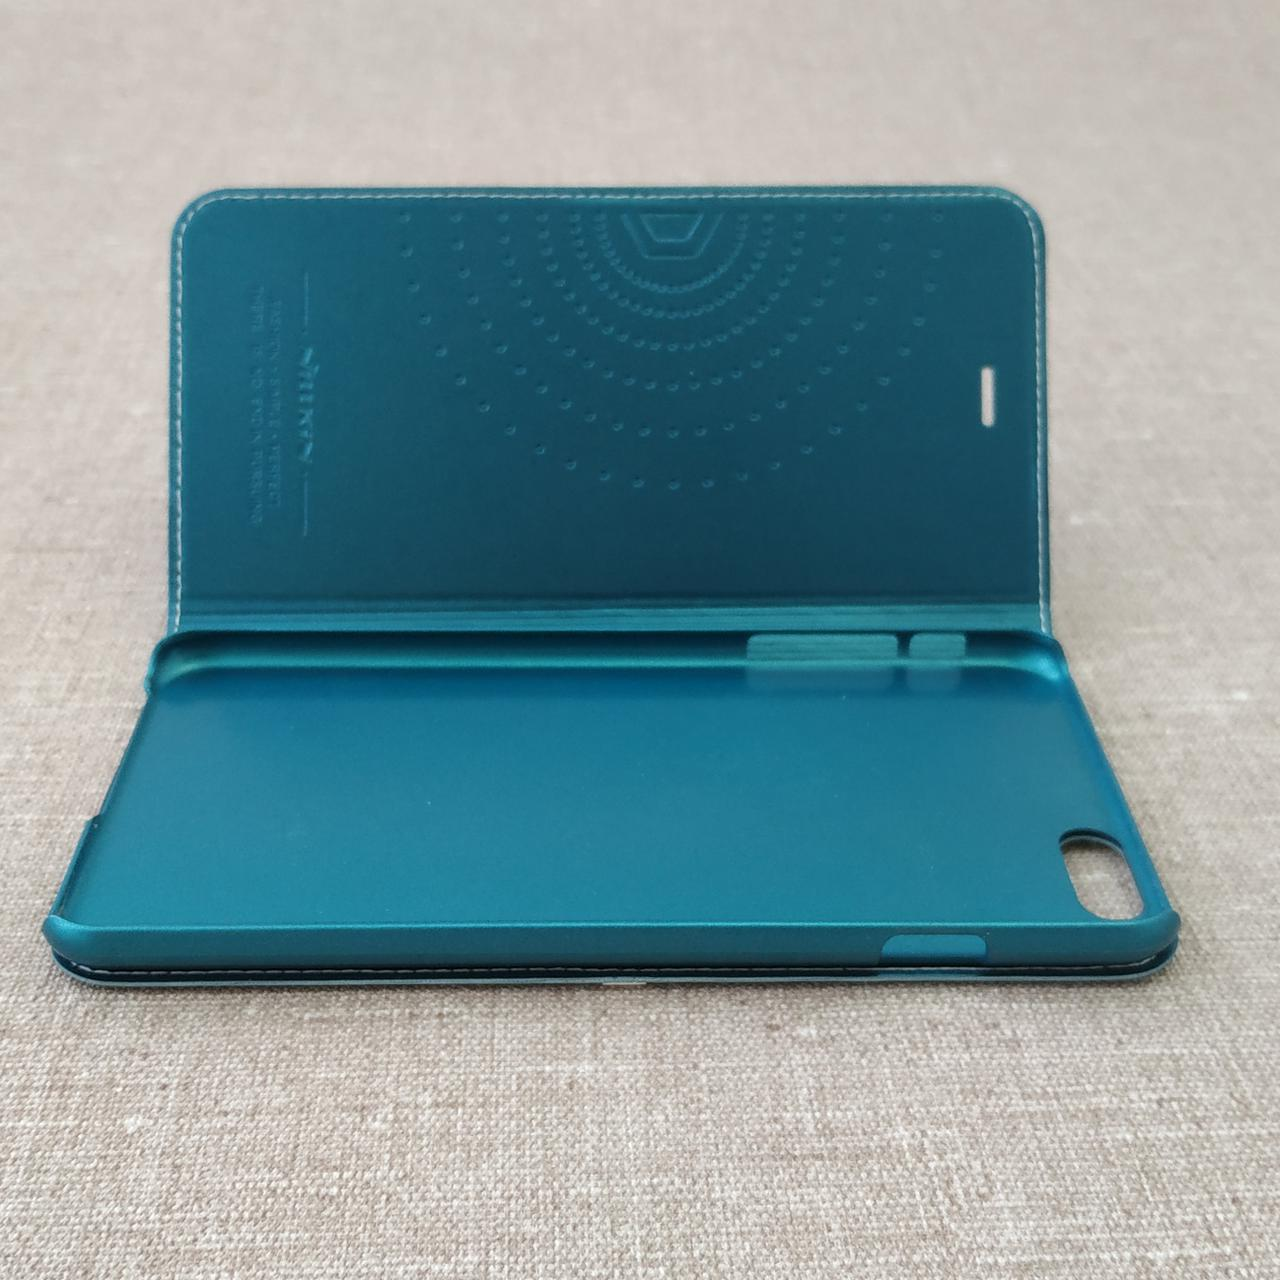 Nillkin Ice iPhone 6 Plus turquoise Для телефона Чехол